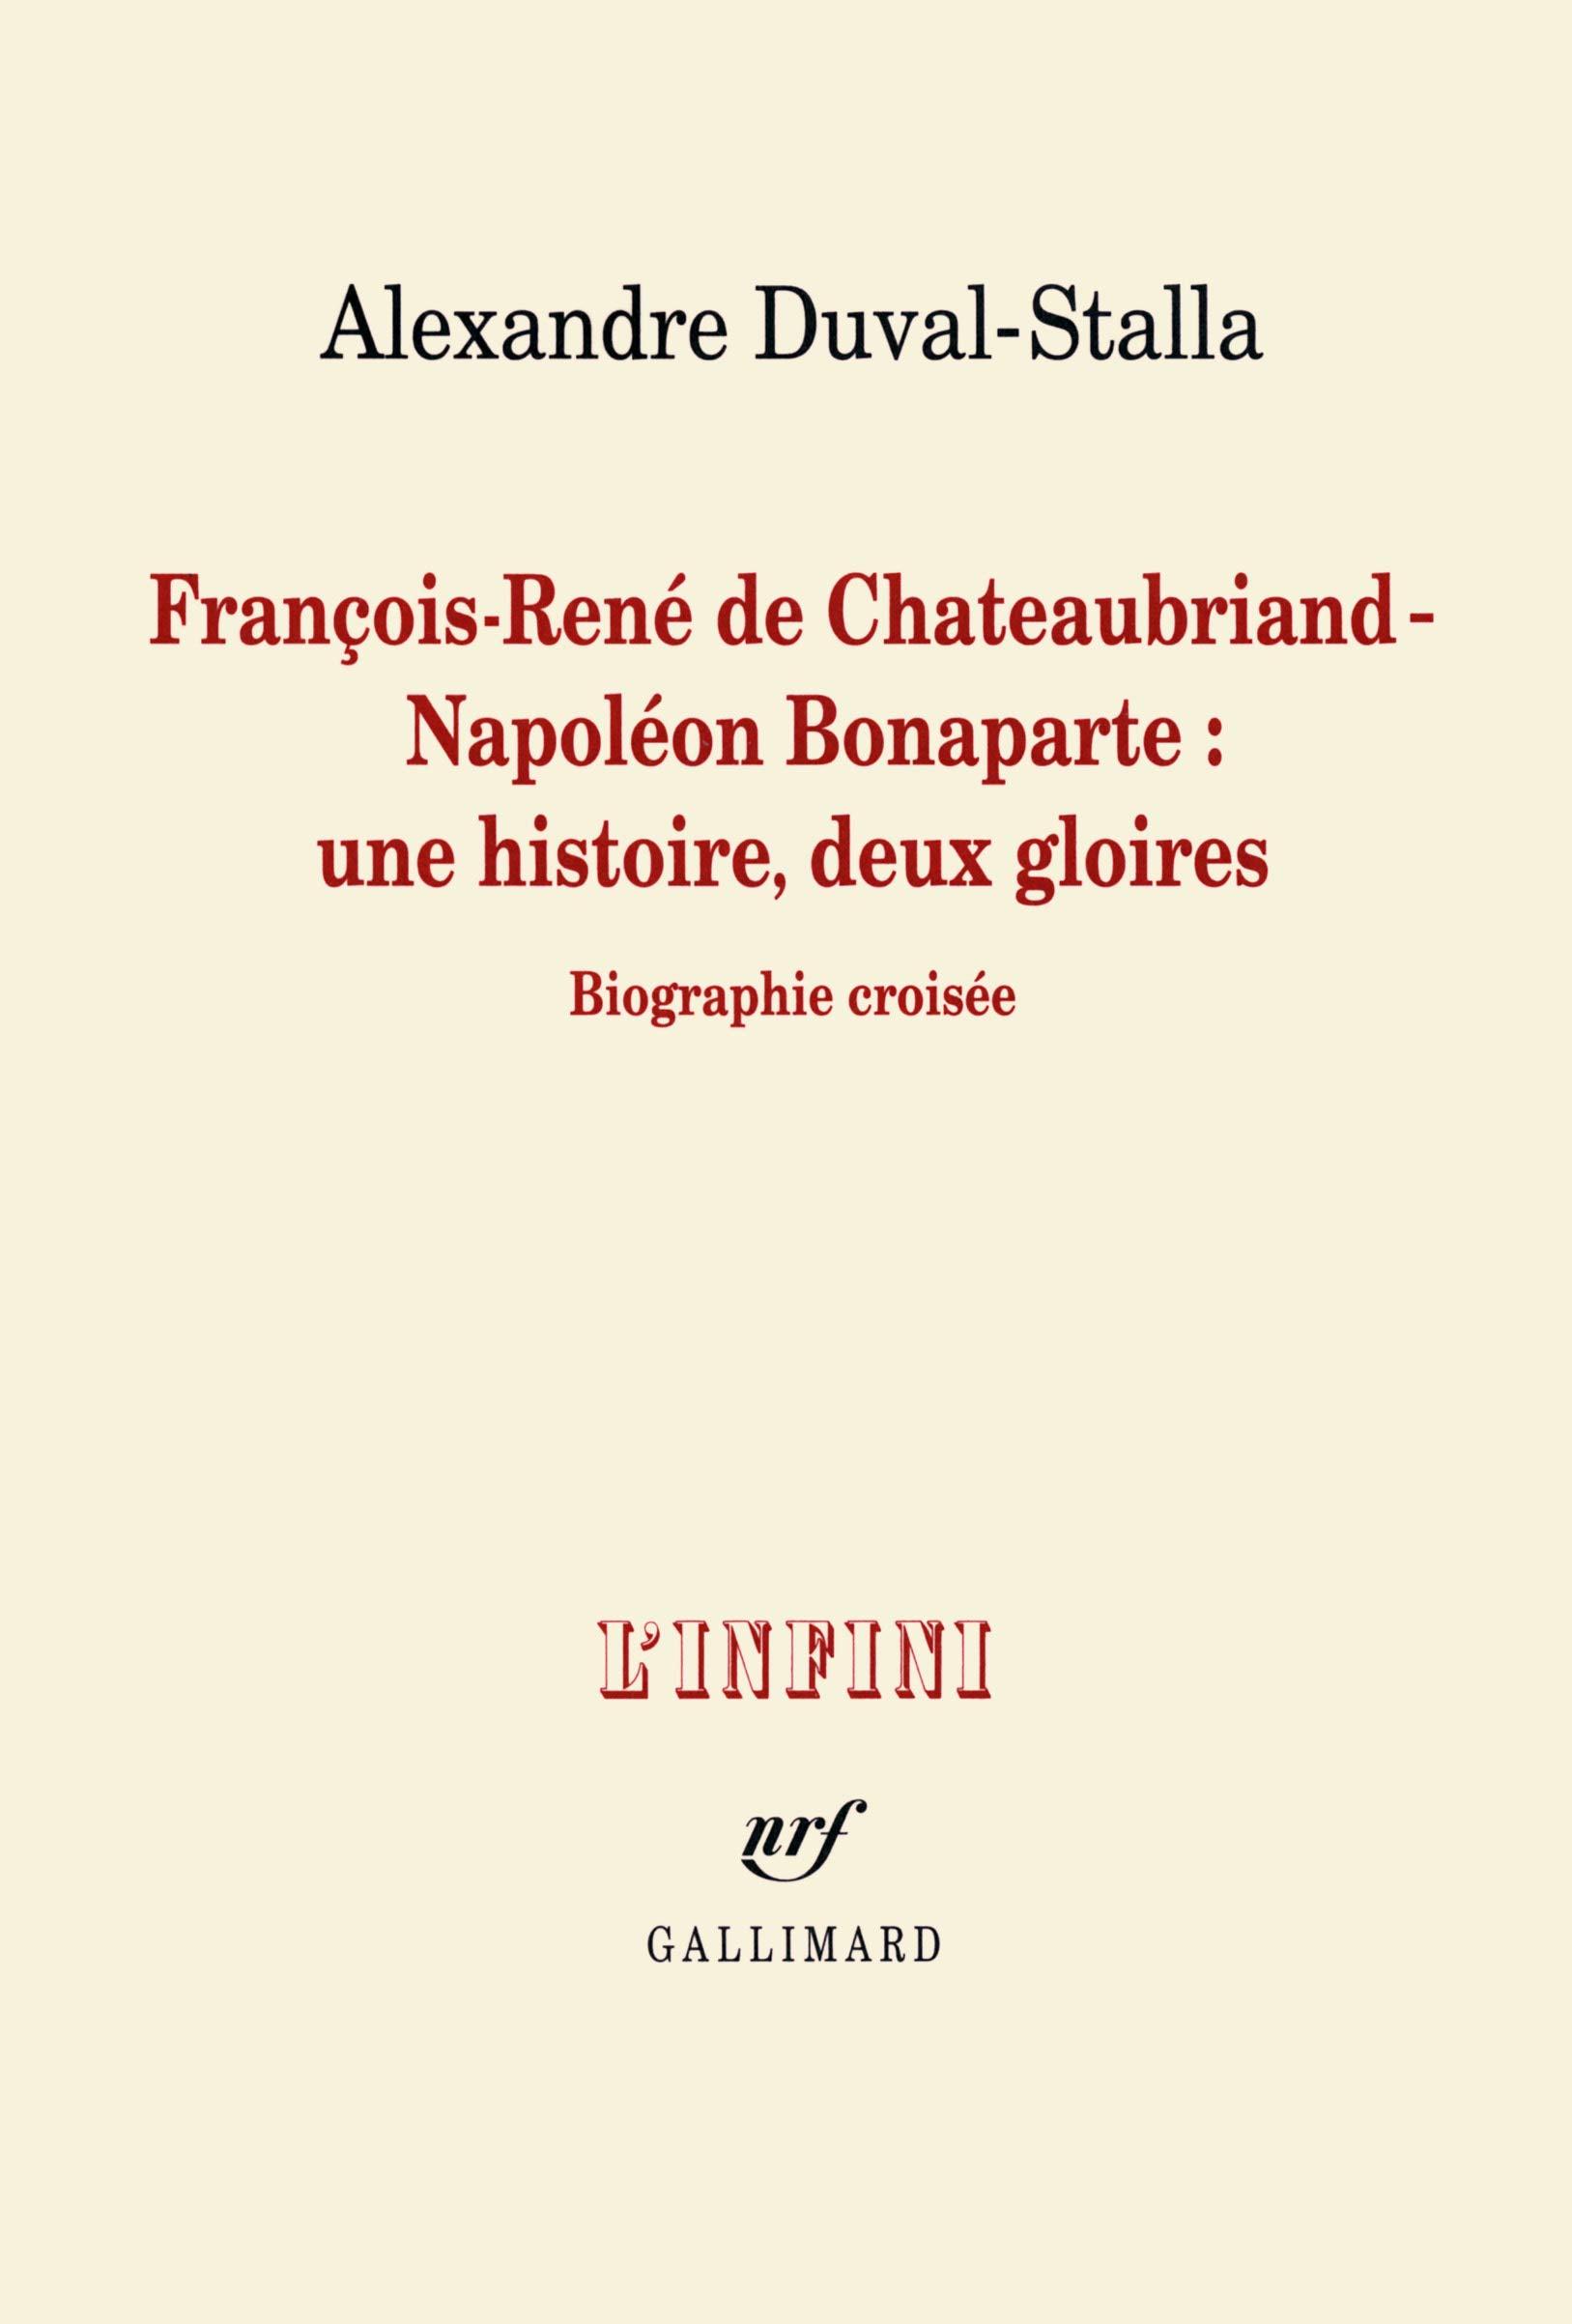 Arbeitsblatt Lebenslauf Von Napoleon Bonaparte 2